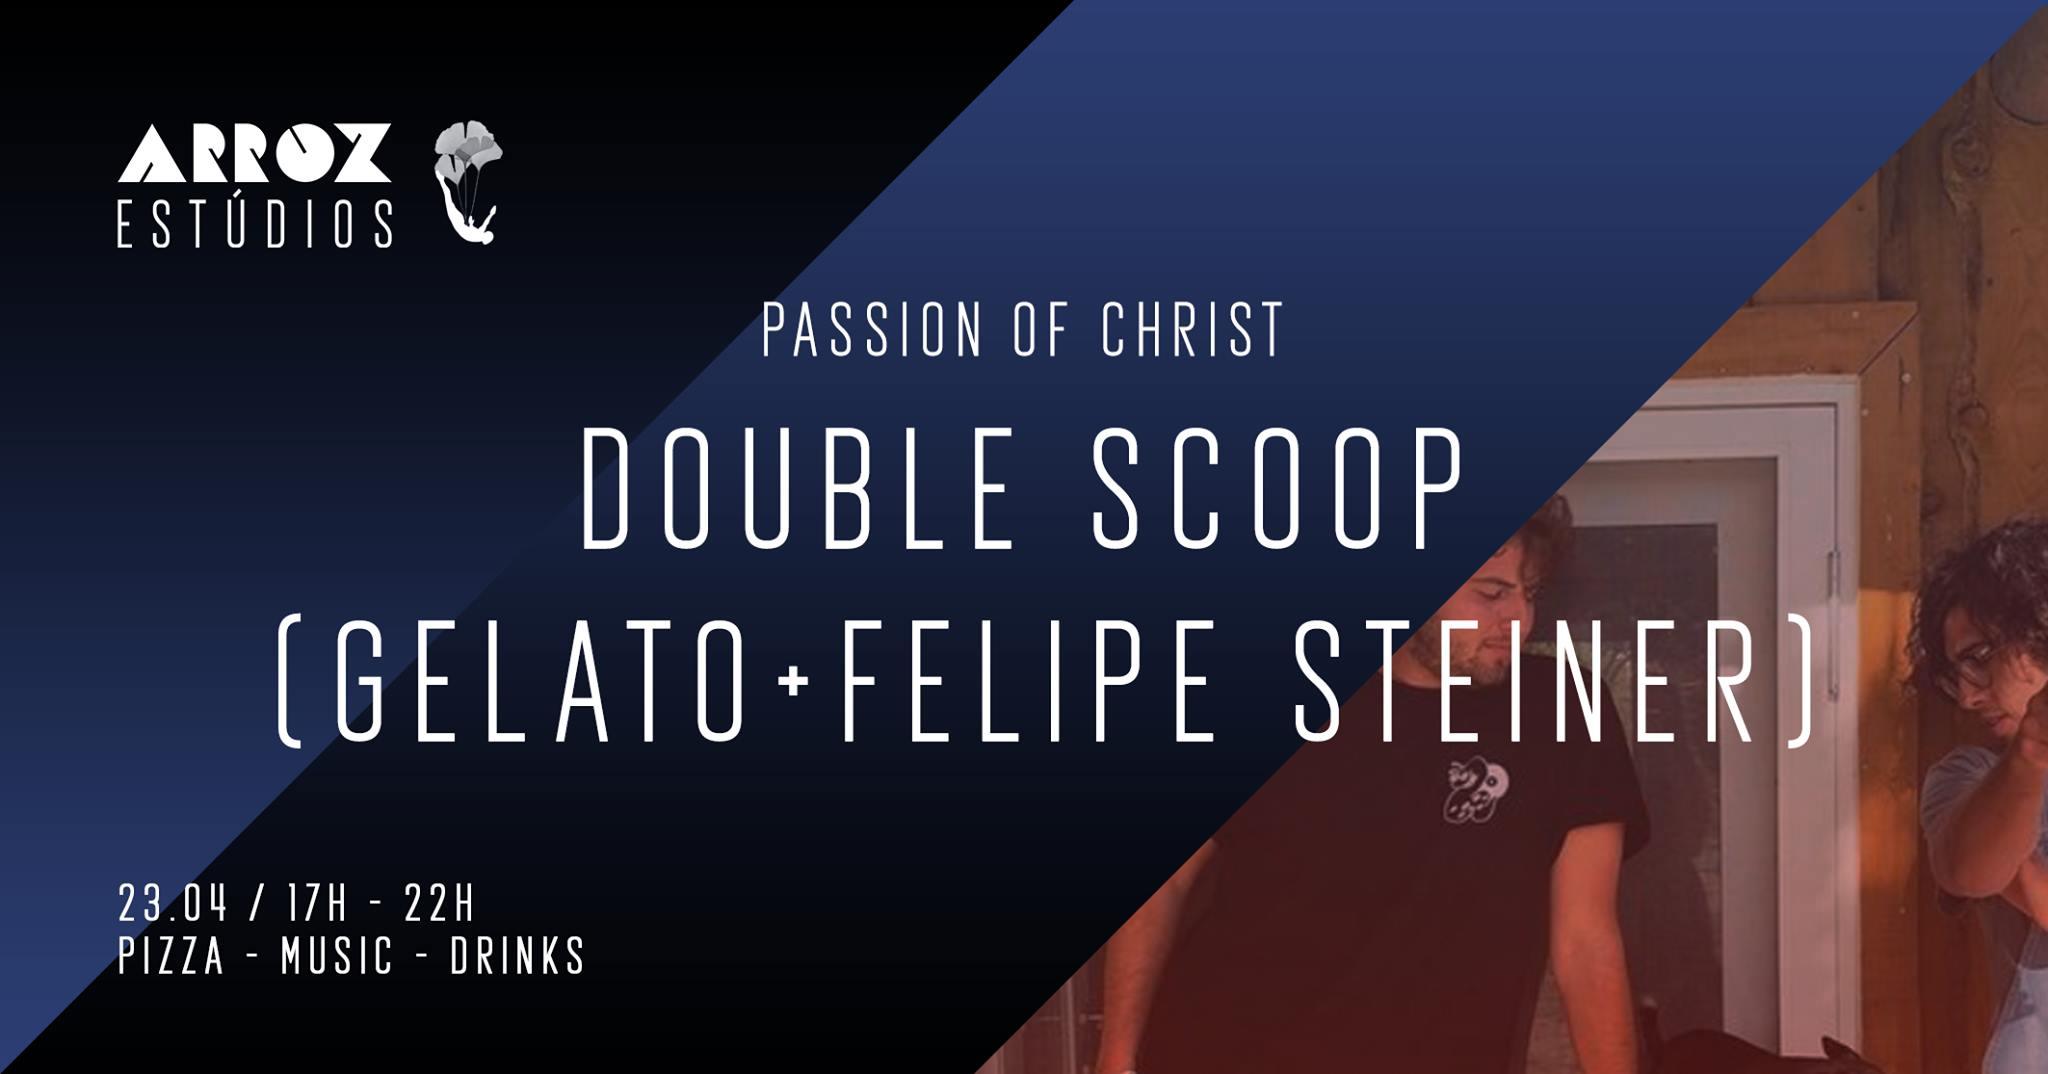 Double Scoop (Gelato + Felipe Steiner) - Passion of Christ